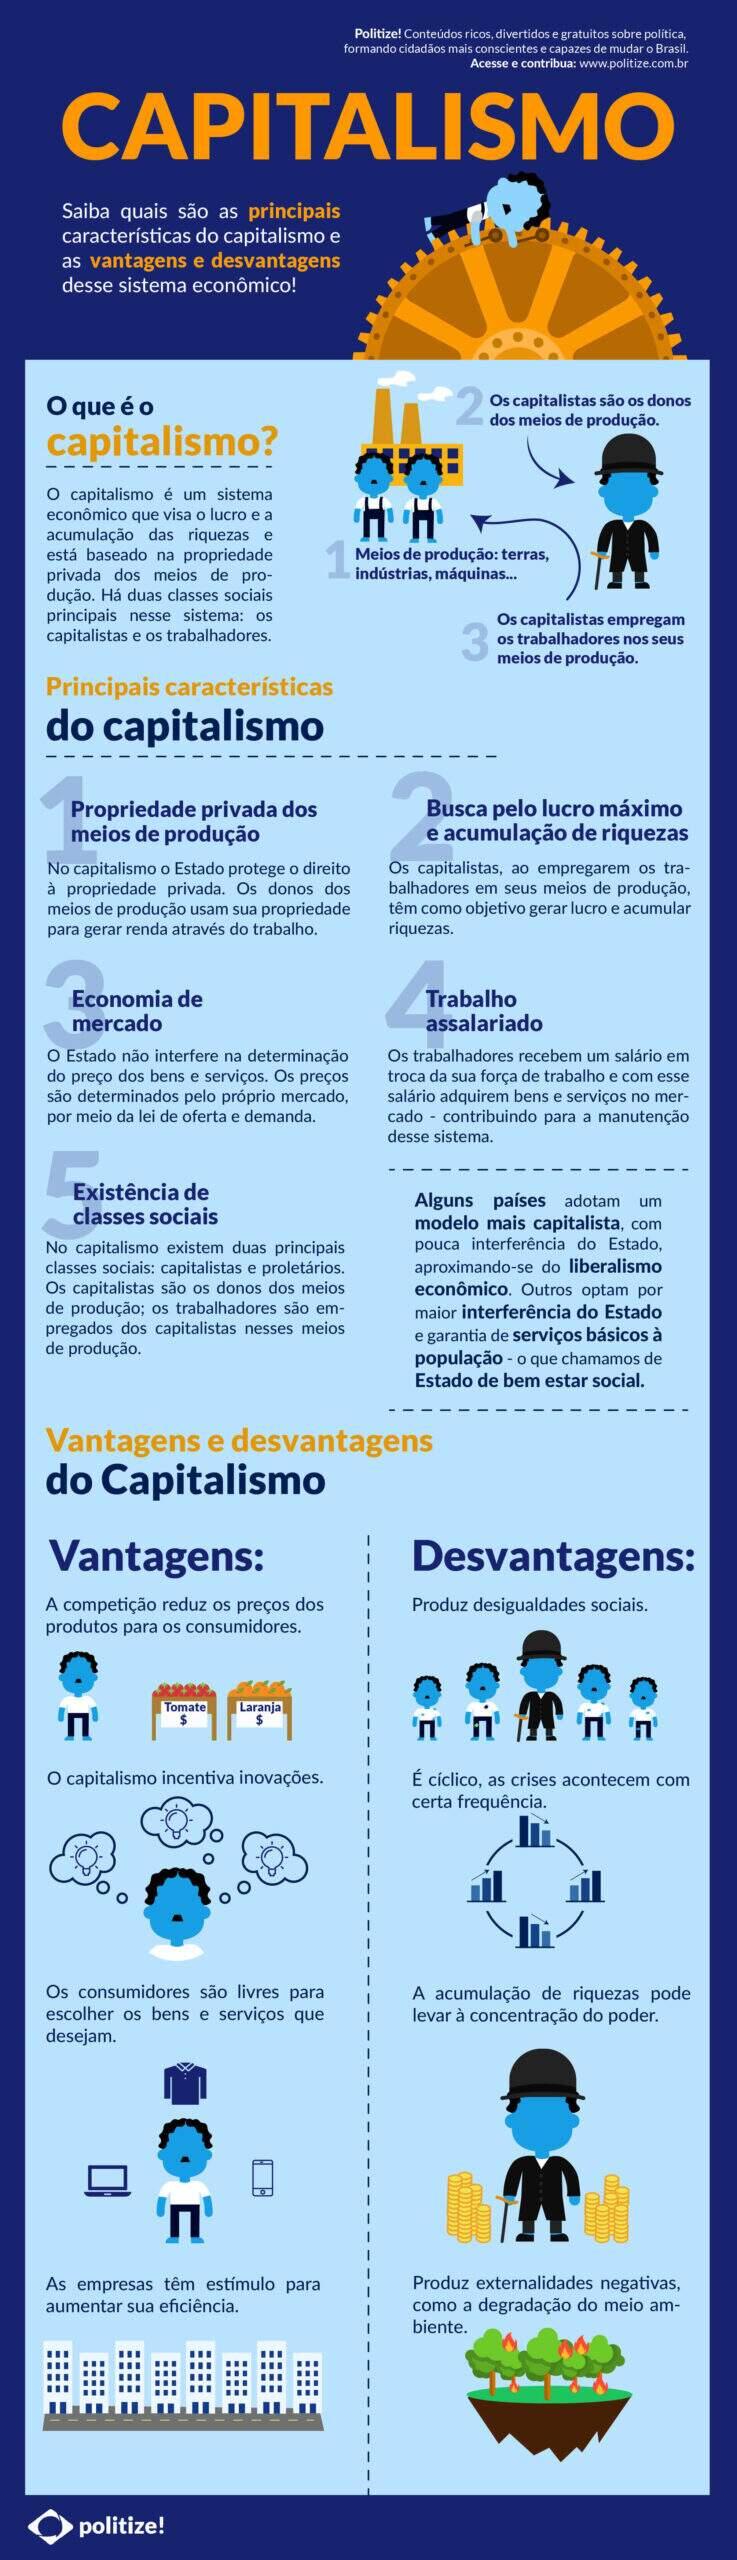 Infográfico Capitalismo